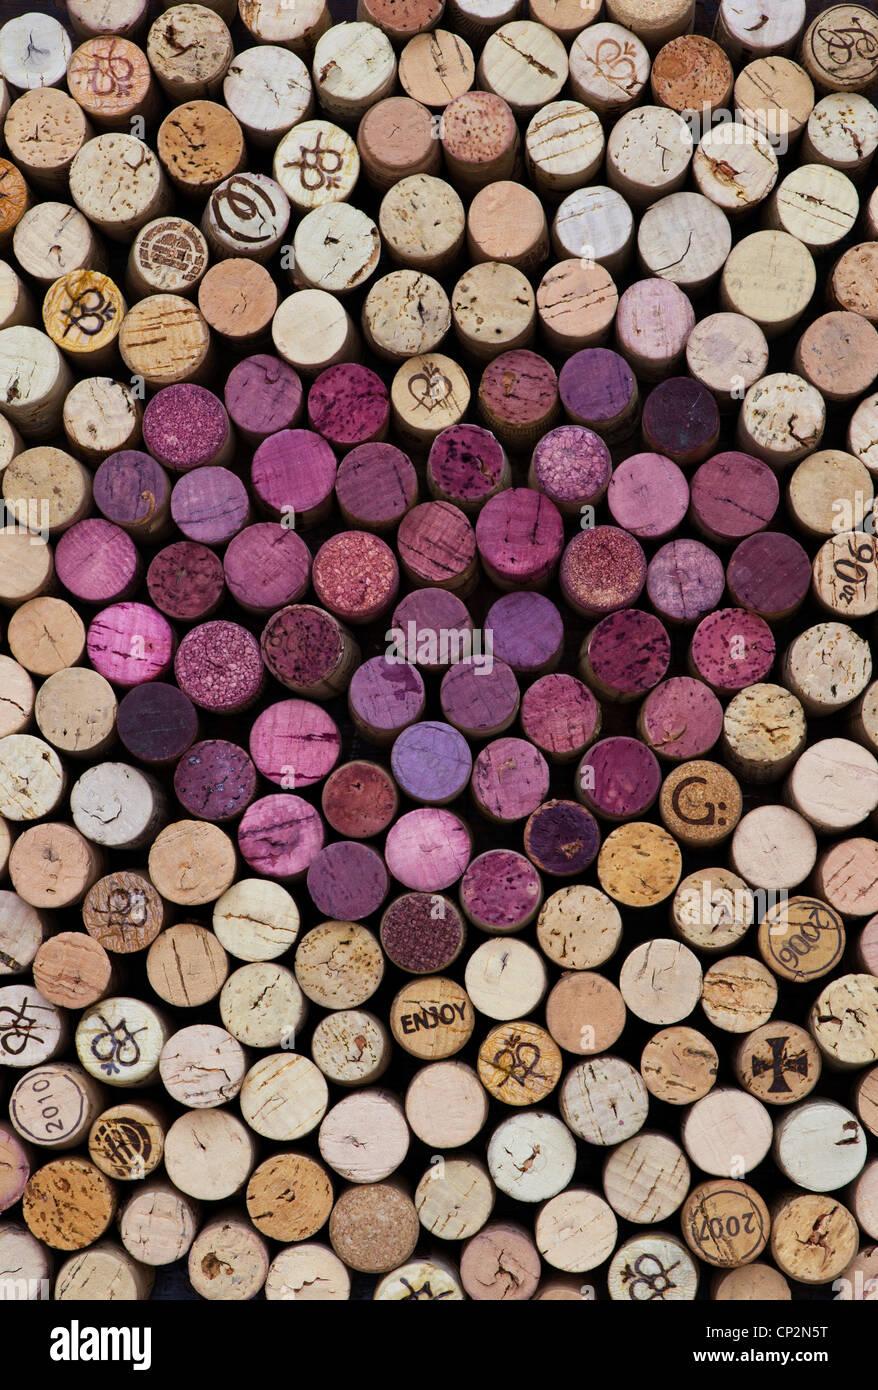 Heart shape red wine cork pattern stock photo royalty for Wine cork patterns